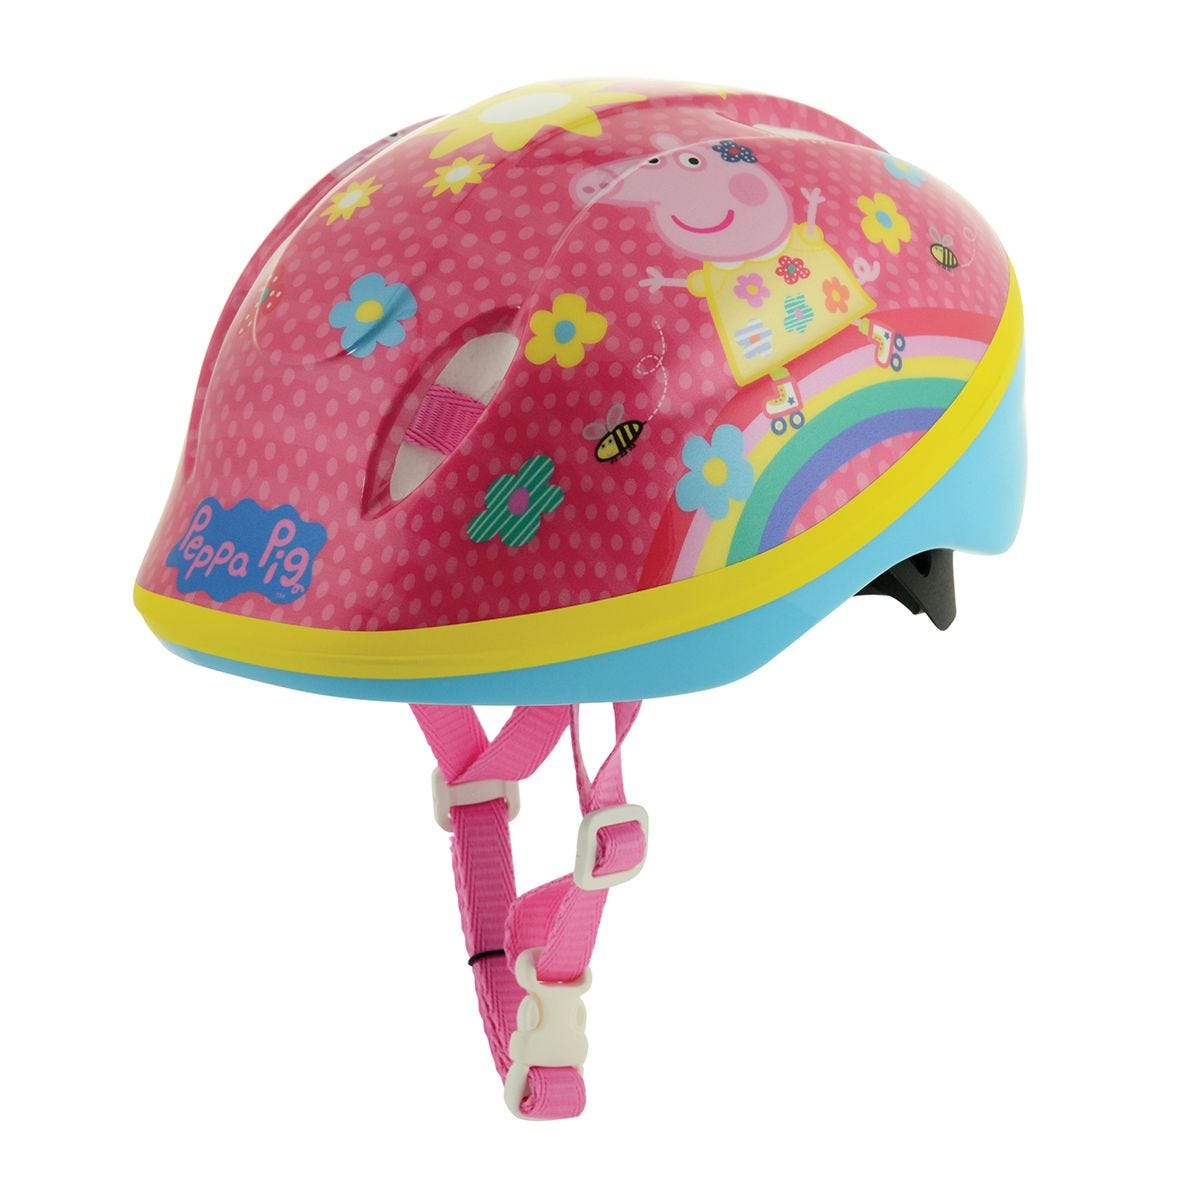 Peppa Pig Safety Helmet